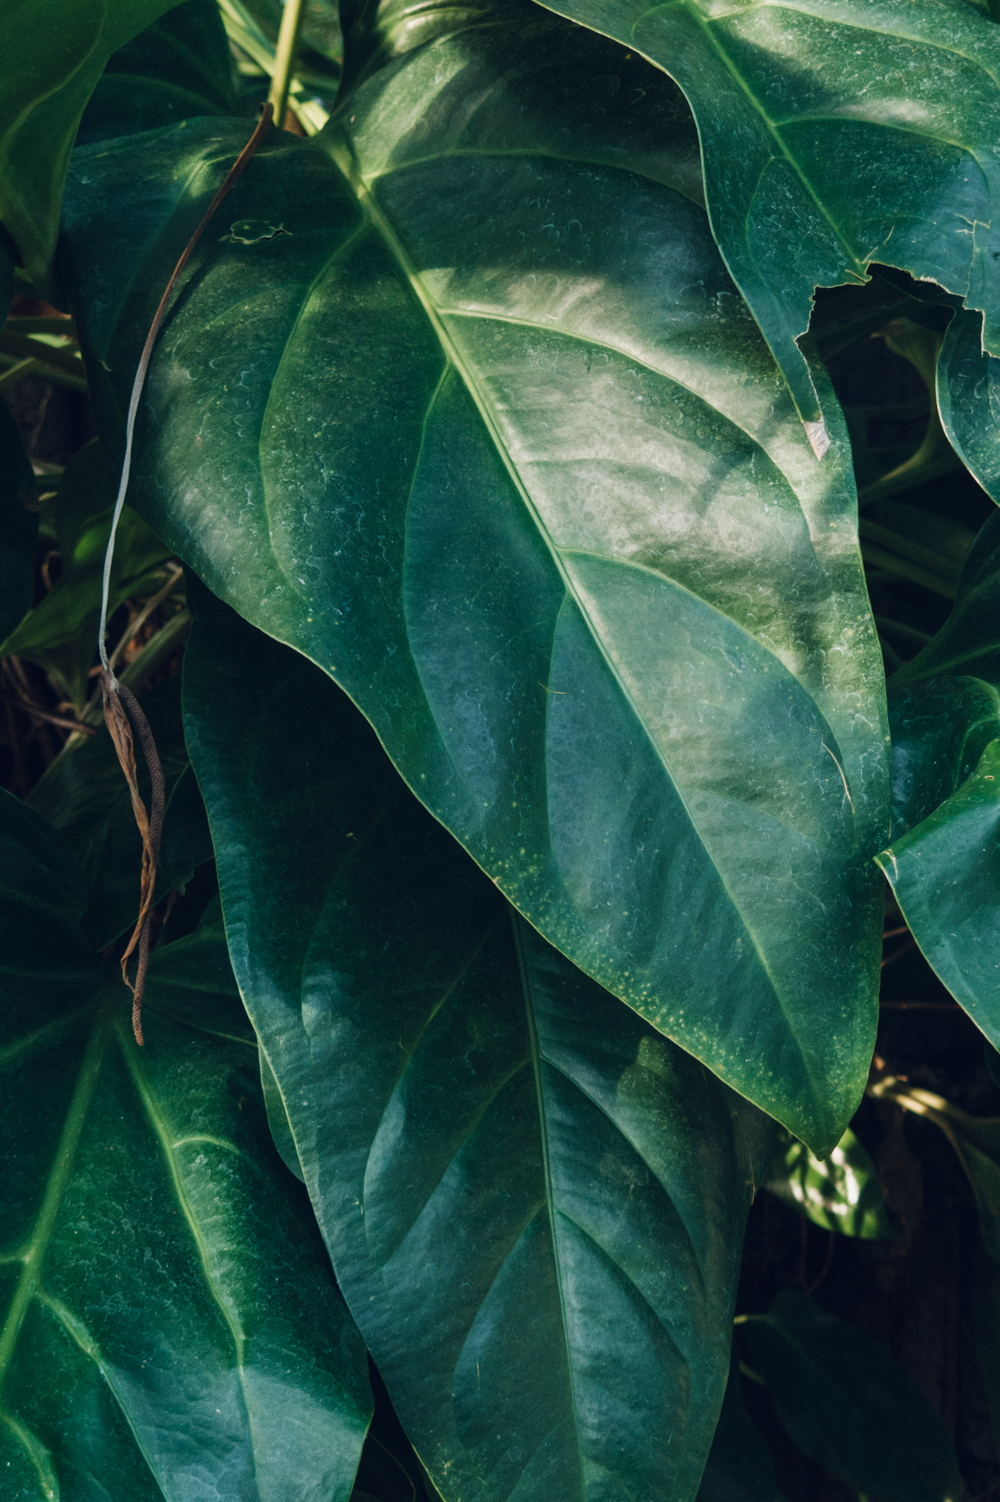 Leaf Leaves Fig Ficus Greenery Foliage Palm